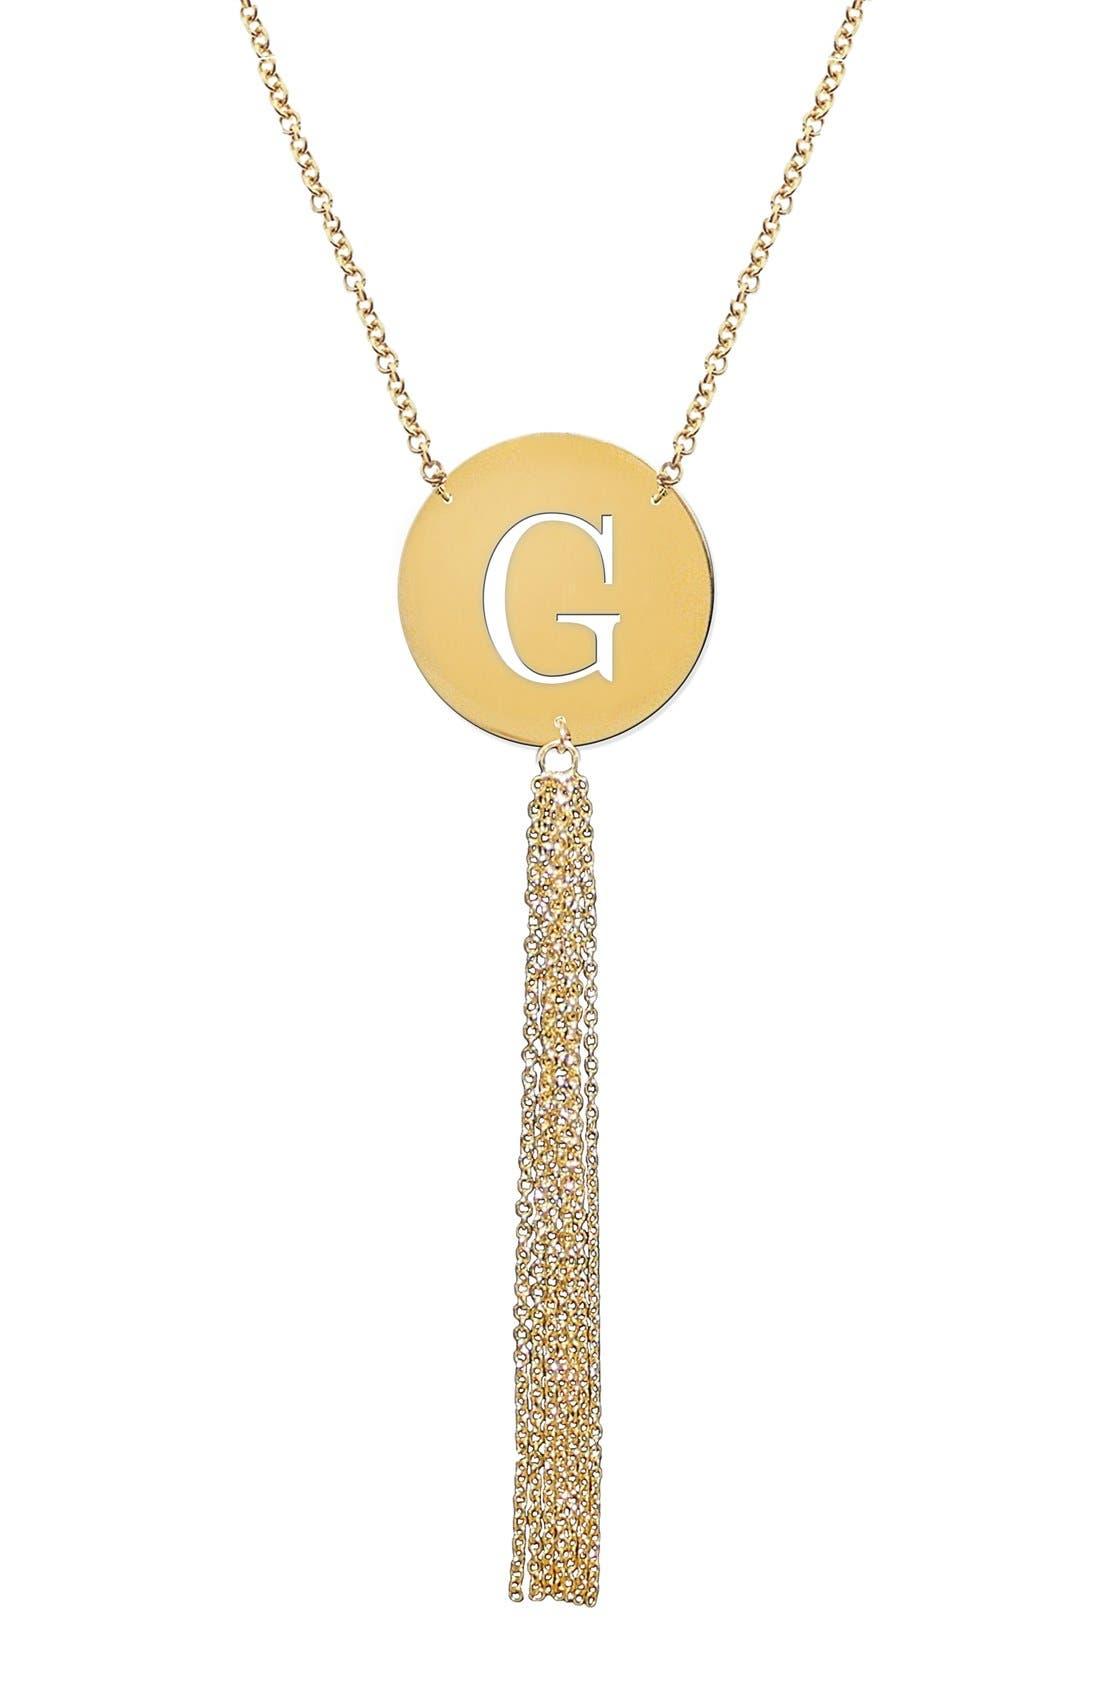 Main Image - Jane Basch Designs Initial Tassel Pendant Necklace